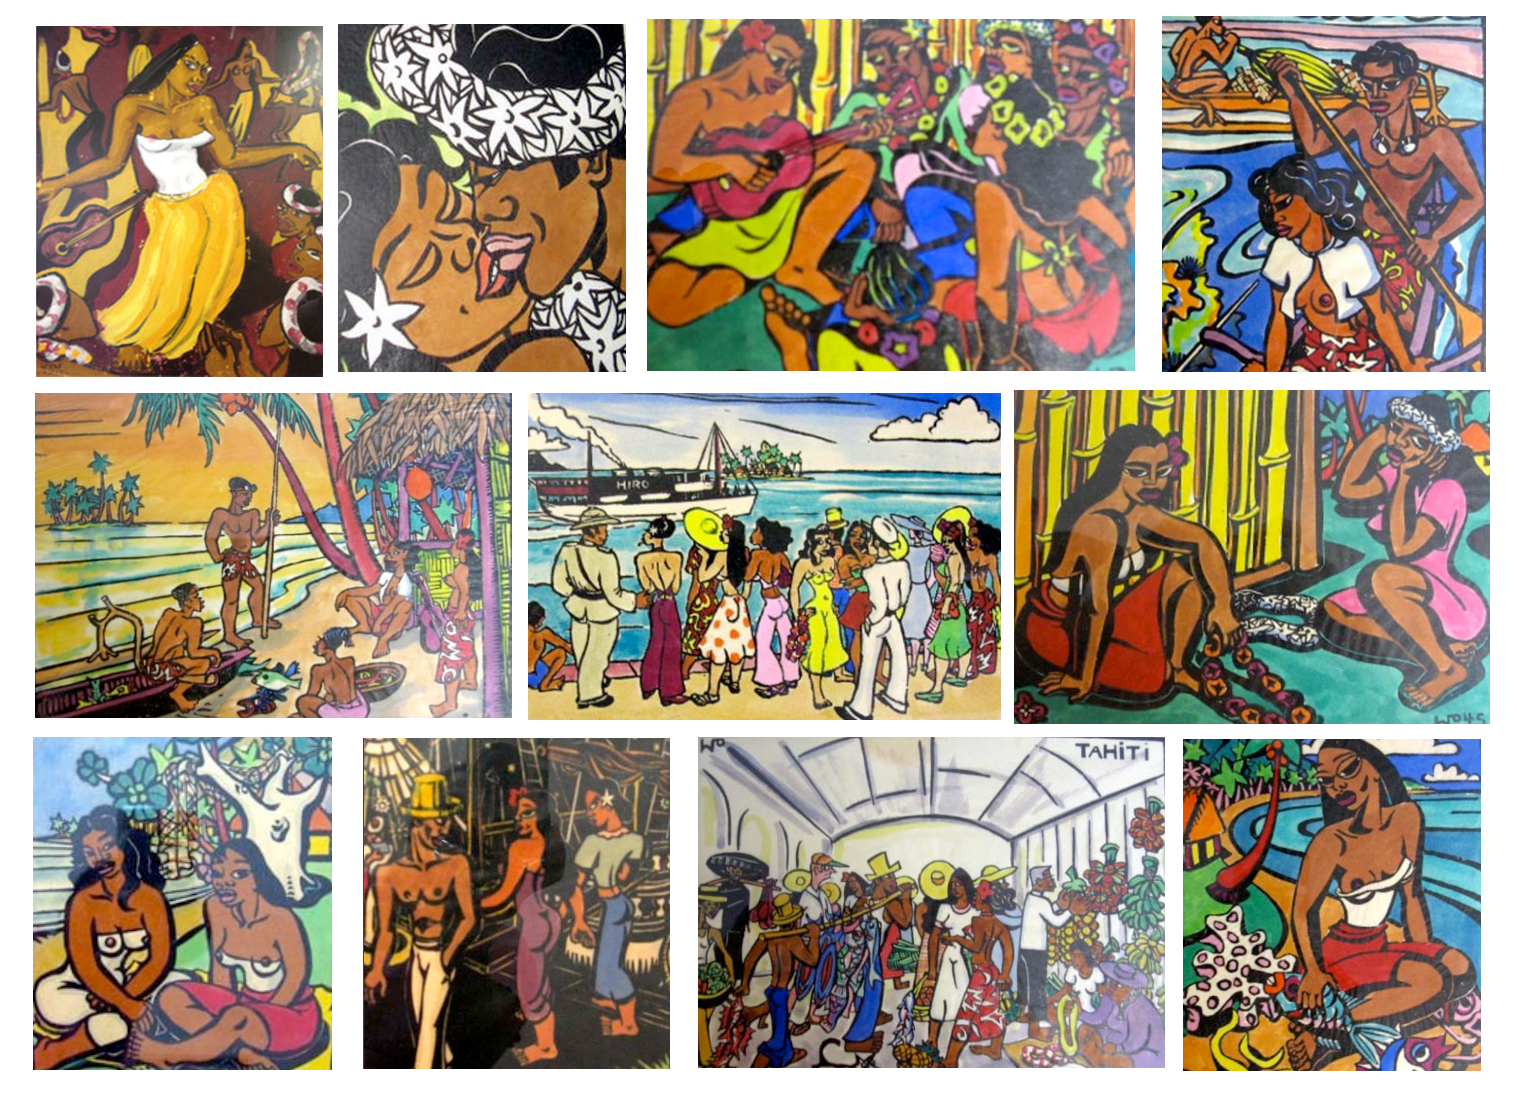 Collage of Tahitian motifs